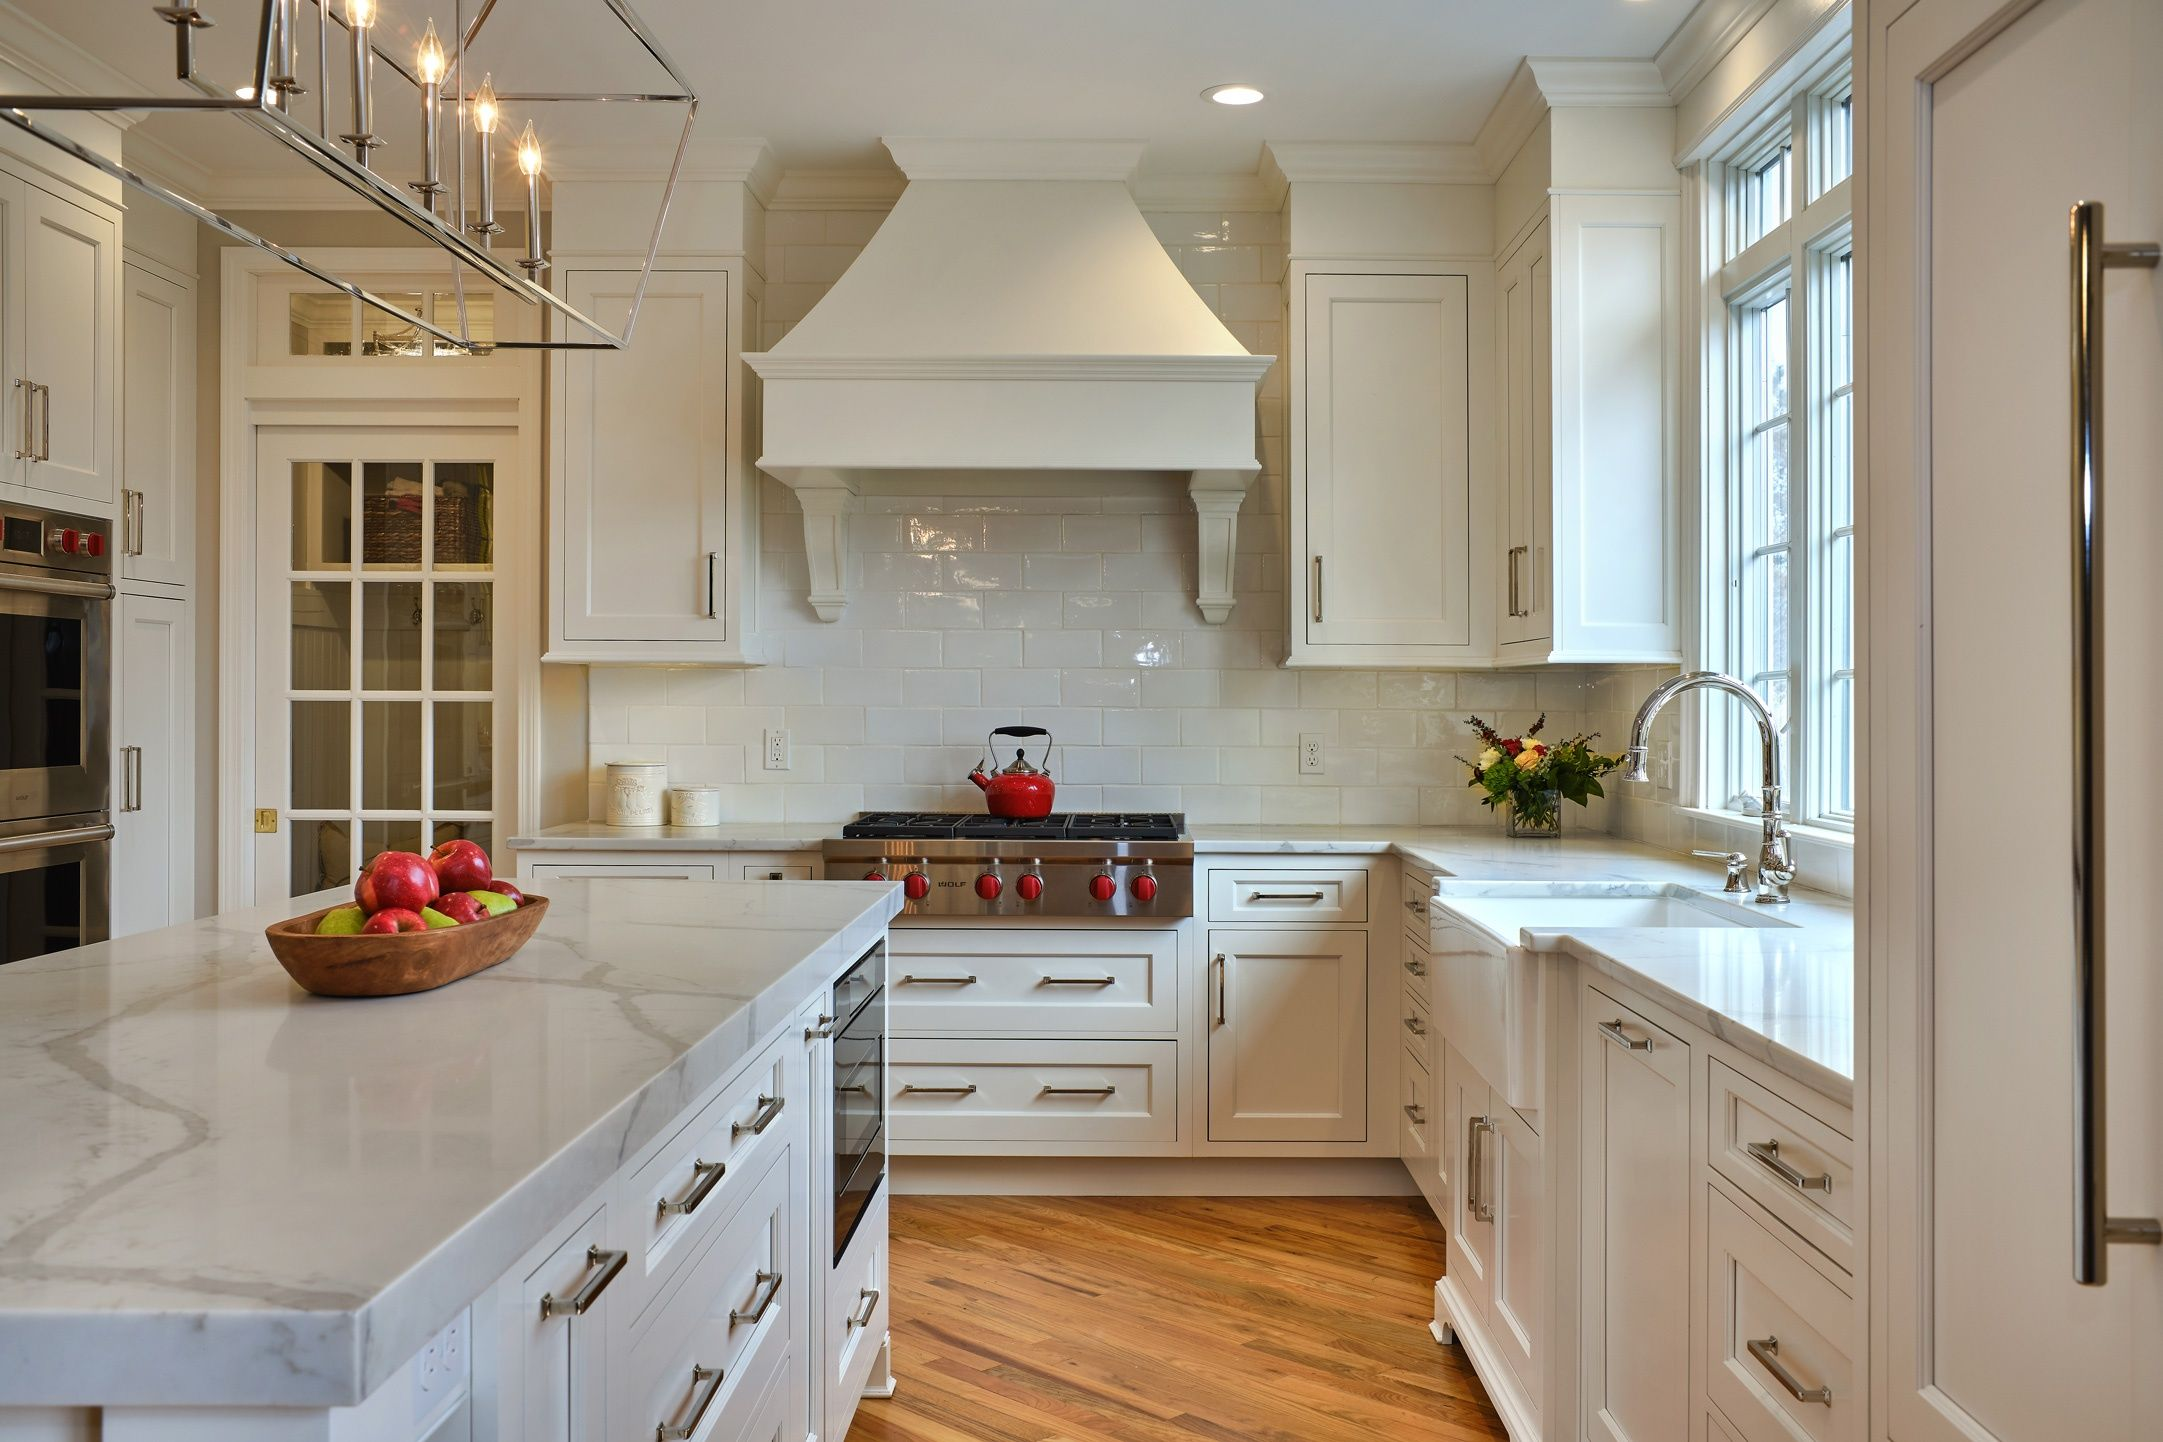 Tranquil Classic Kitchen Design In Milford Ct The Kitchen Company Classic Kitchens Classic Kitchen Design Refinish Kitchen Cabinets